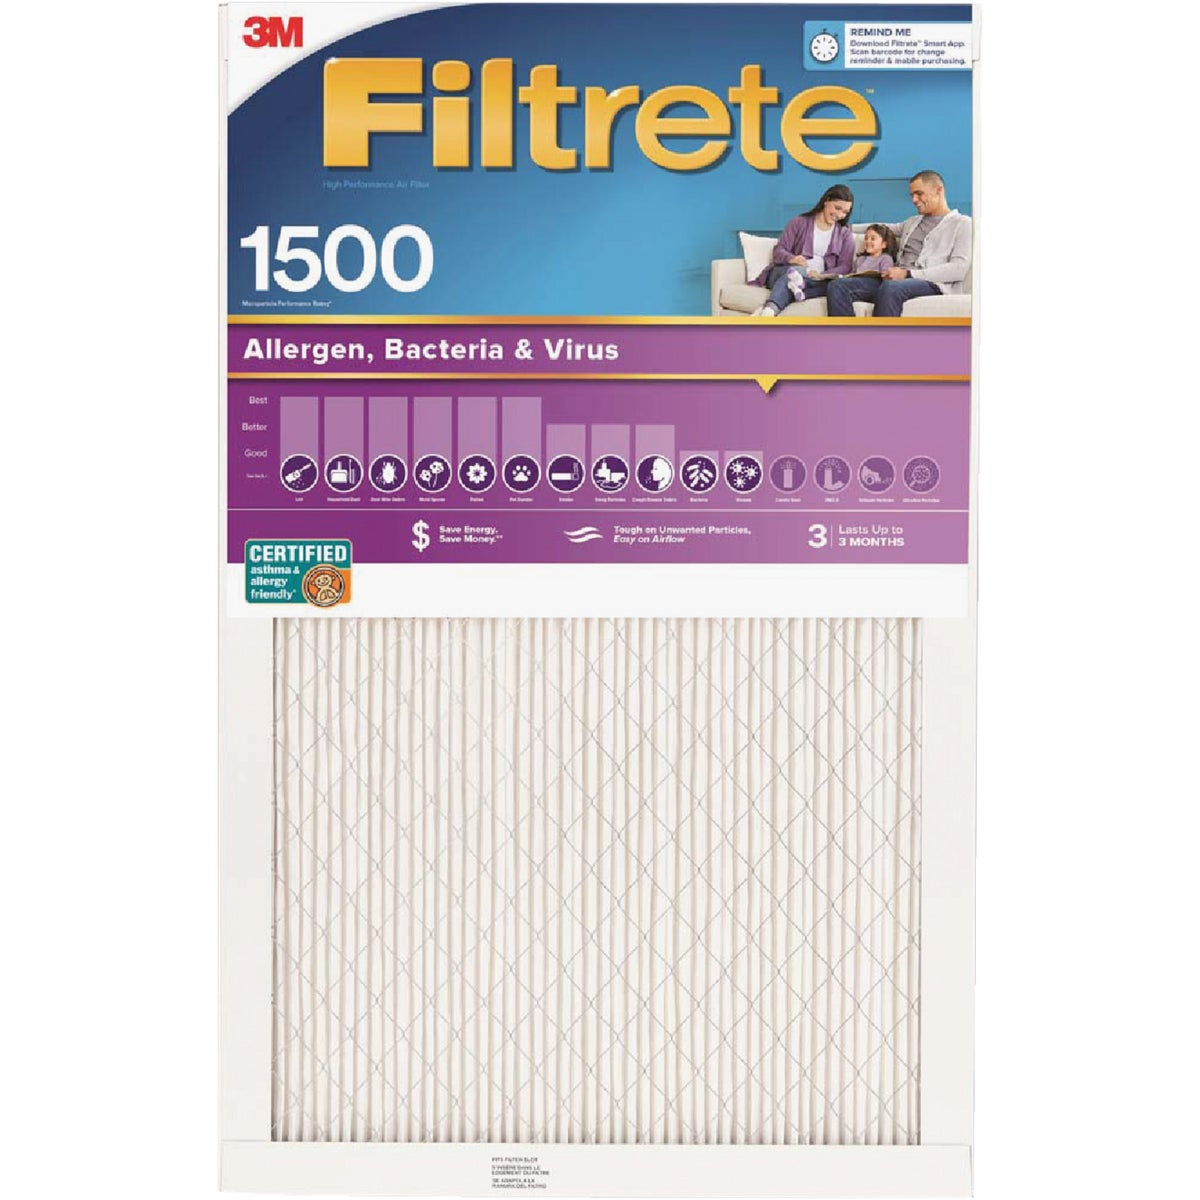 3M Filtrete 20 In. x 20 In. x 1 In. Ultra Allergen Healthy Living 1550 MPR Furnace Filter